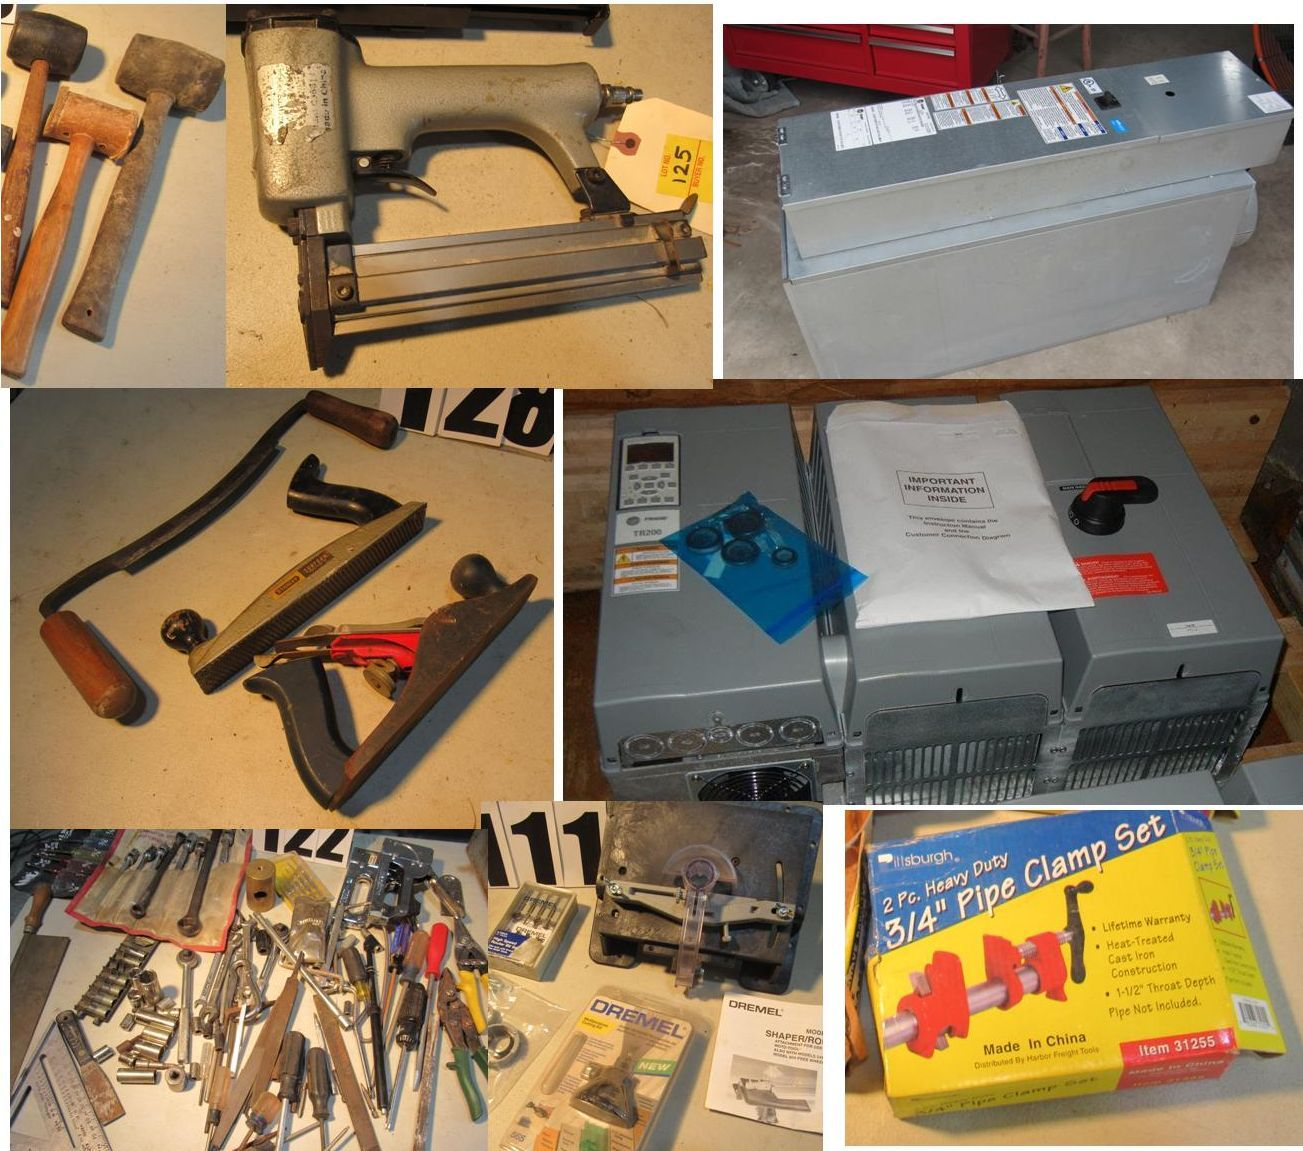 HVAC Equipment, Tools, Hardware